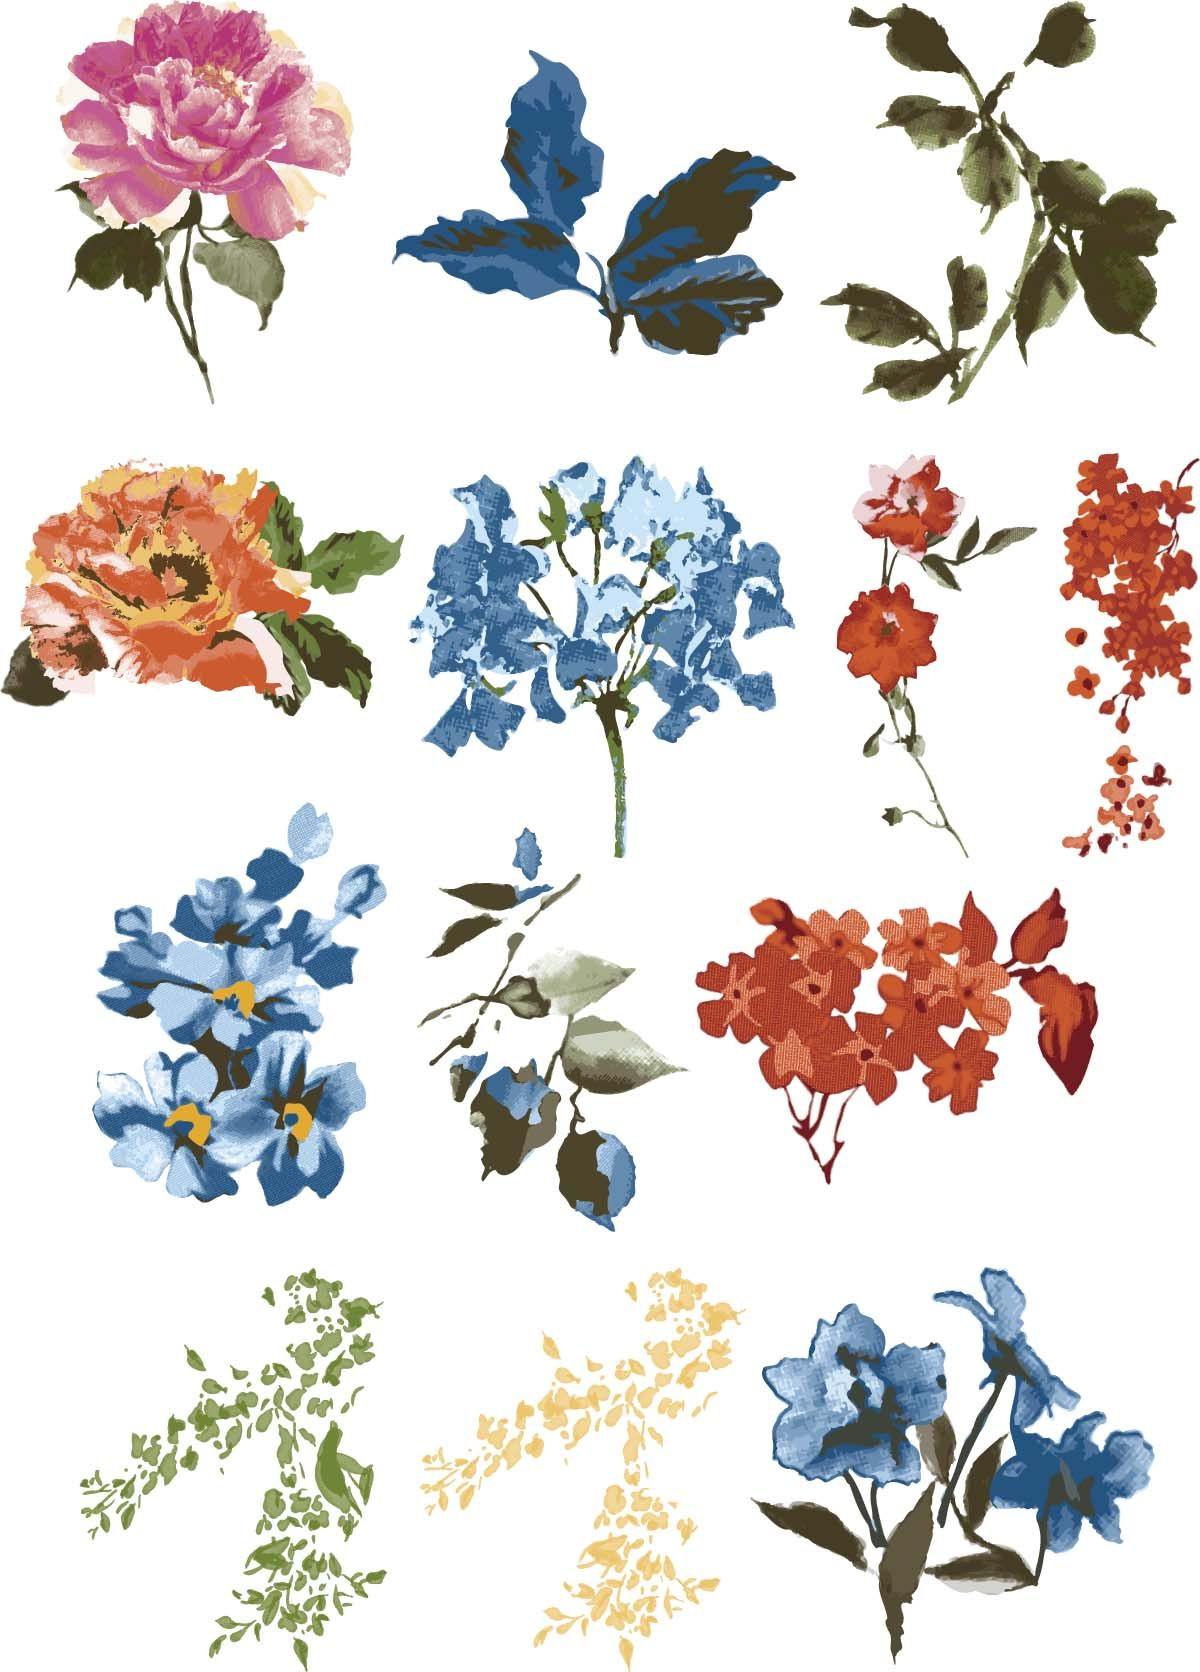 Vintage floral design elements vector collection Design